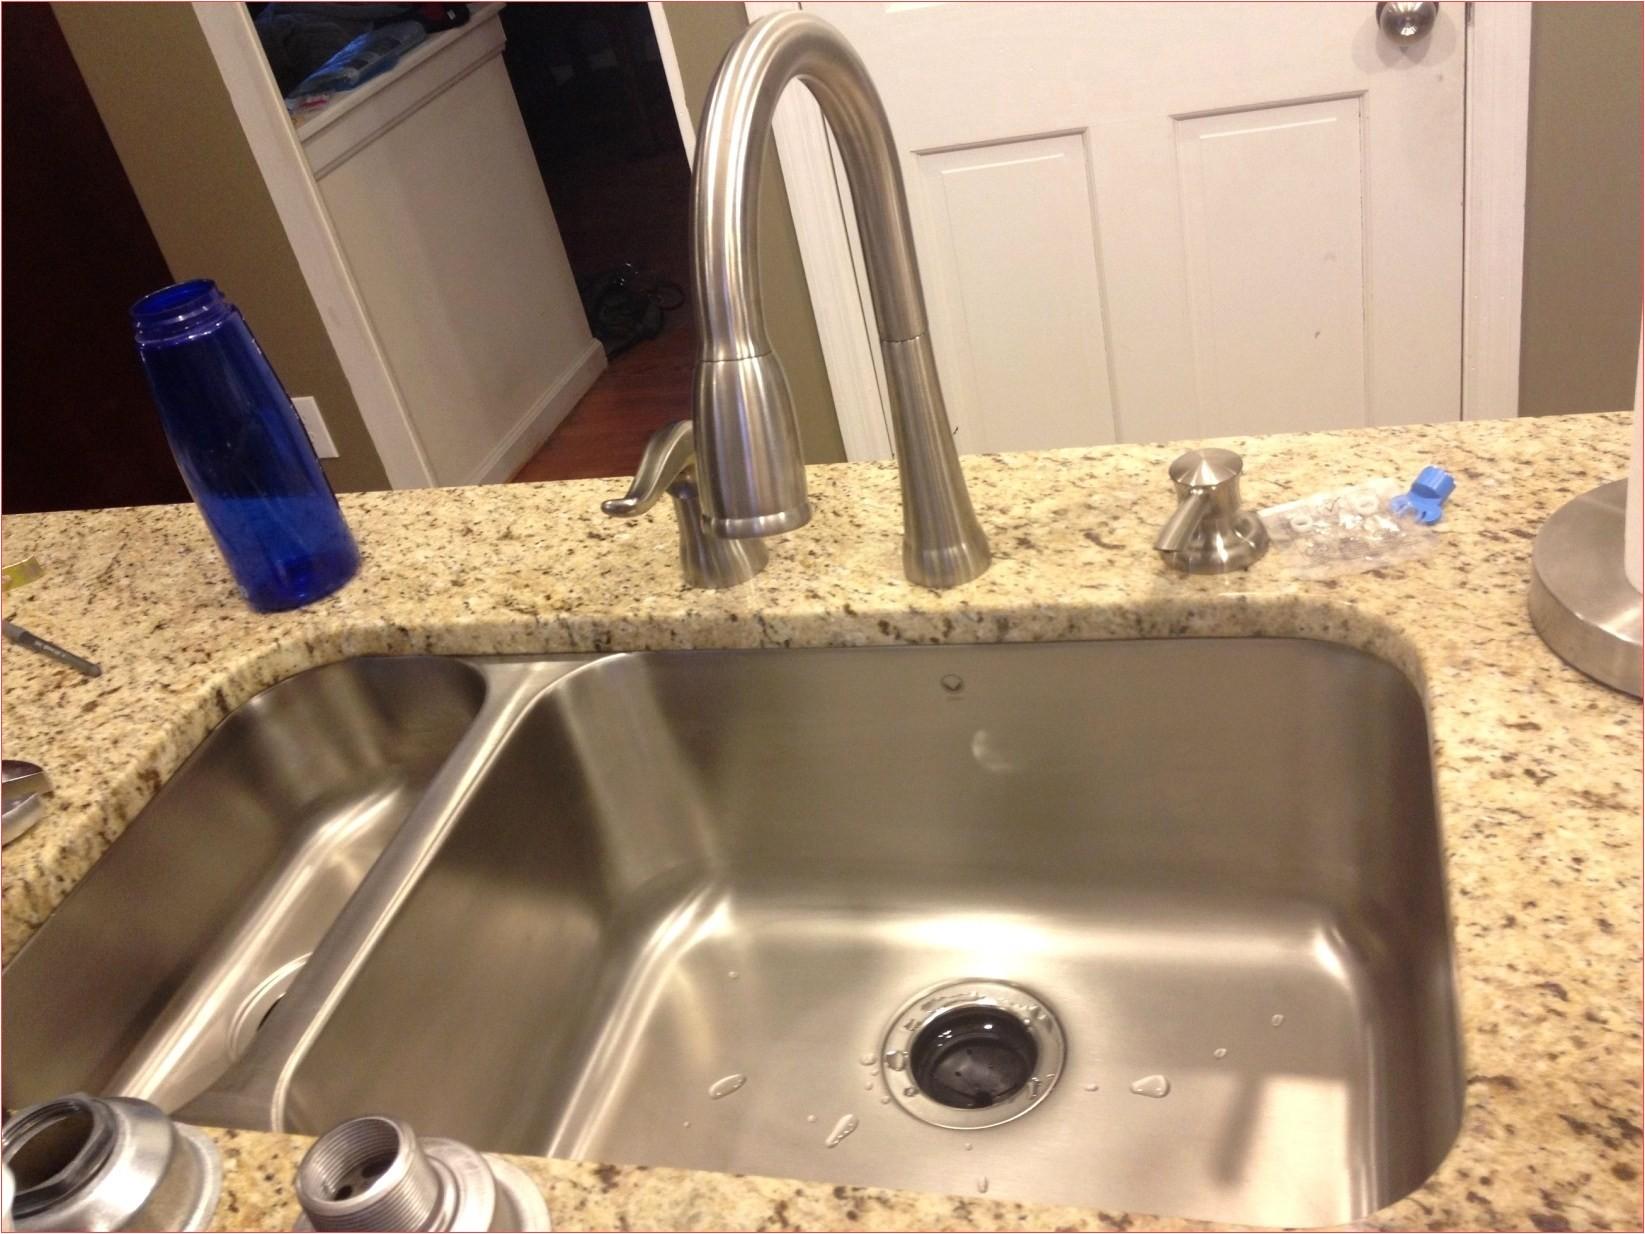 clogged tub drain beautiful h sink how to clear clogged bathroom i